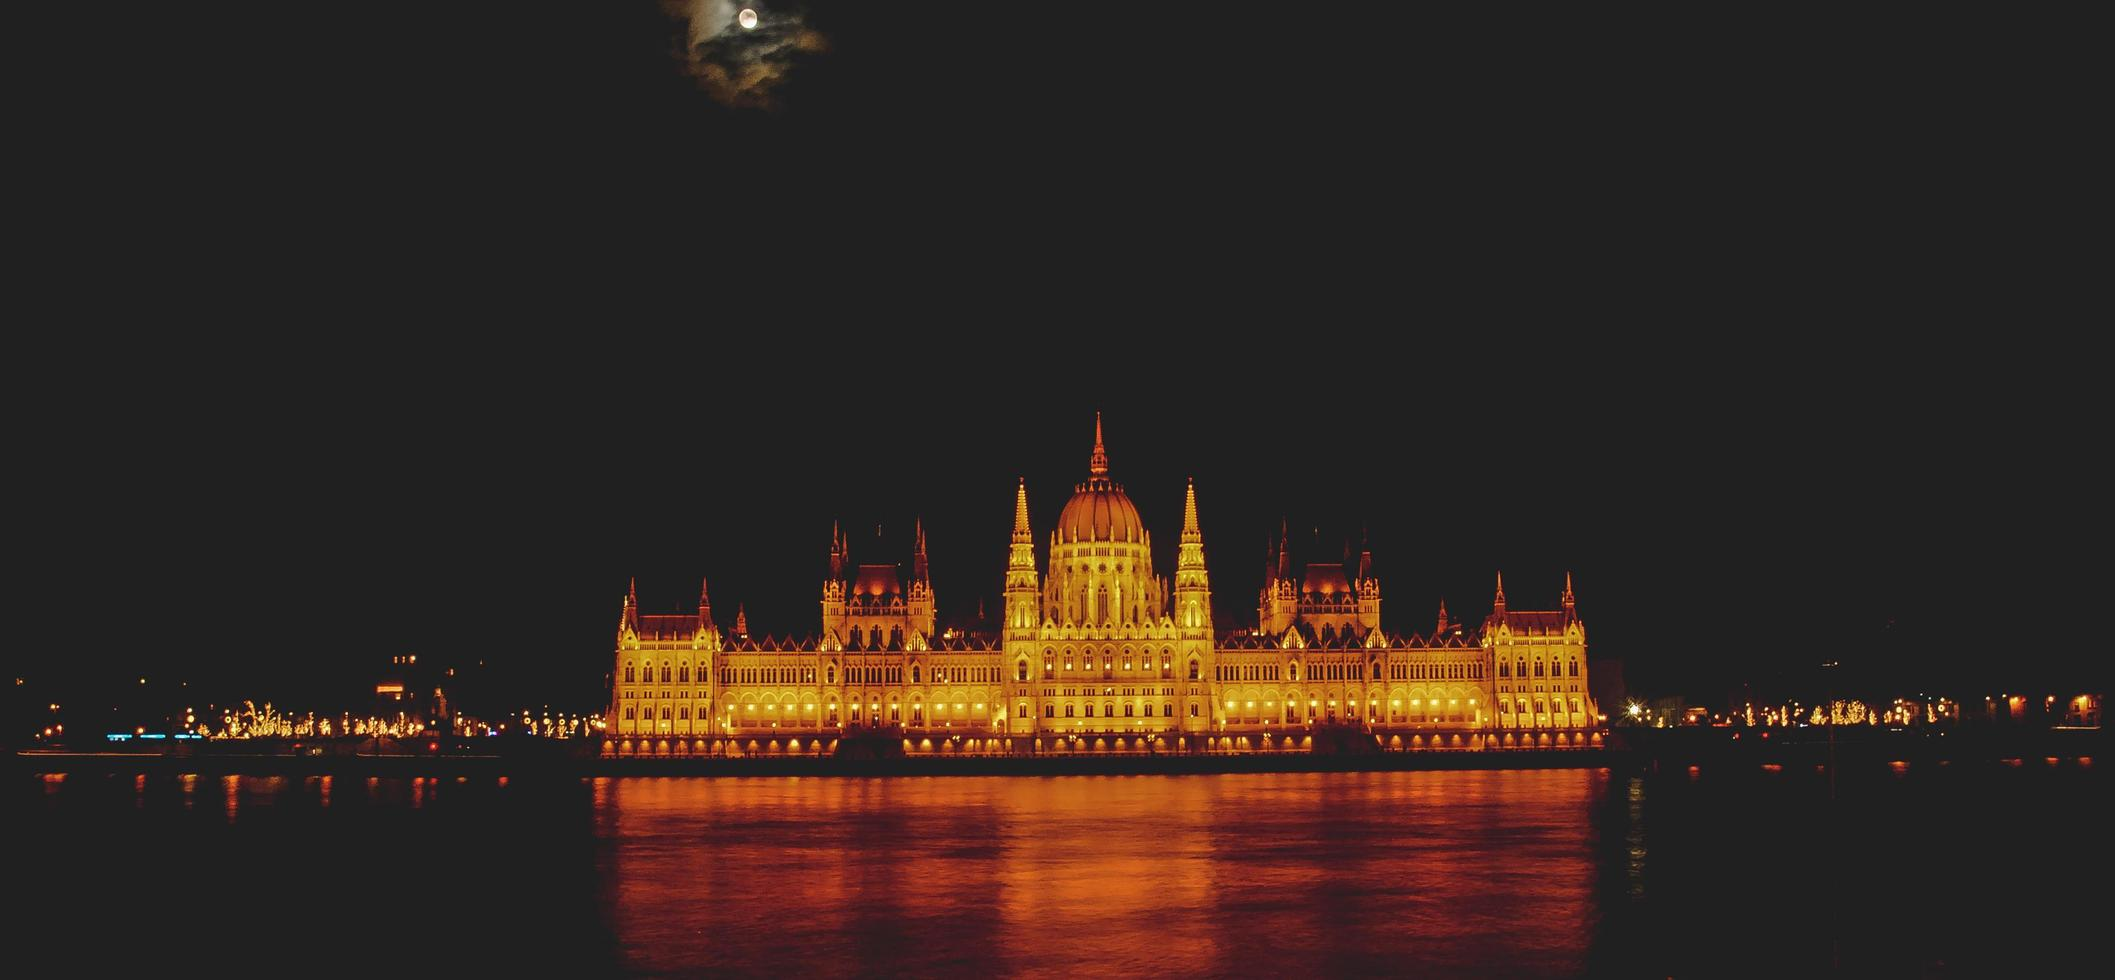 den ungerska parlamentsbyggnaden i Budapest, Ungern foto